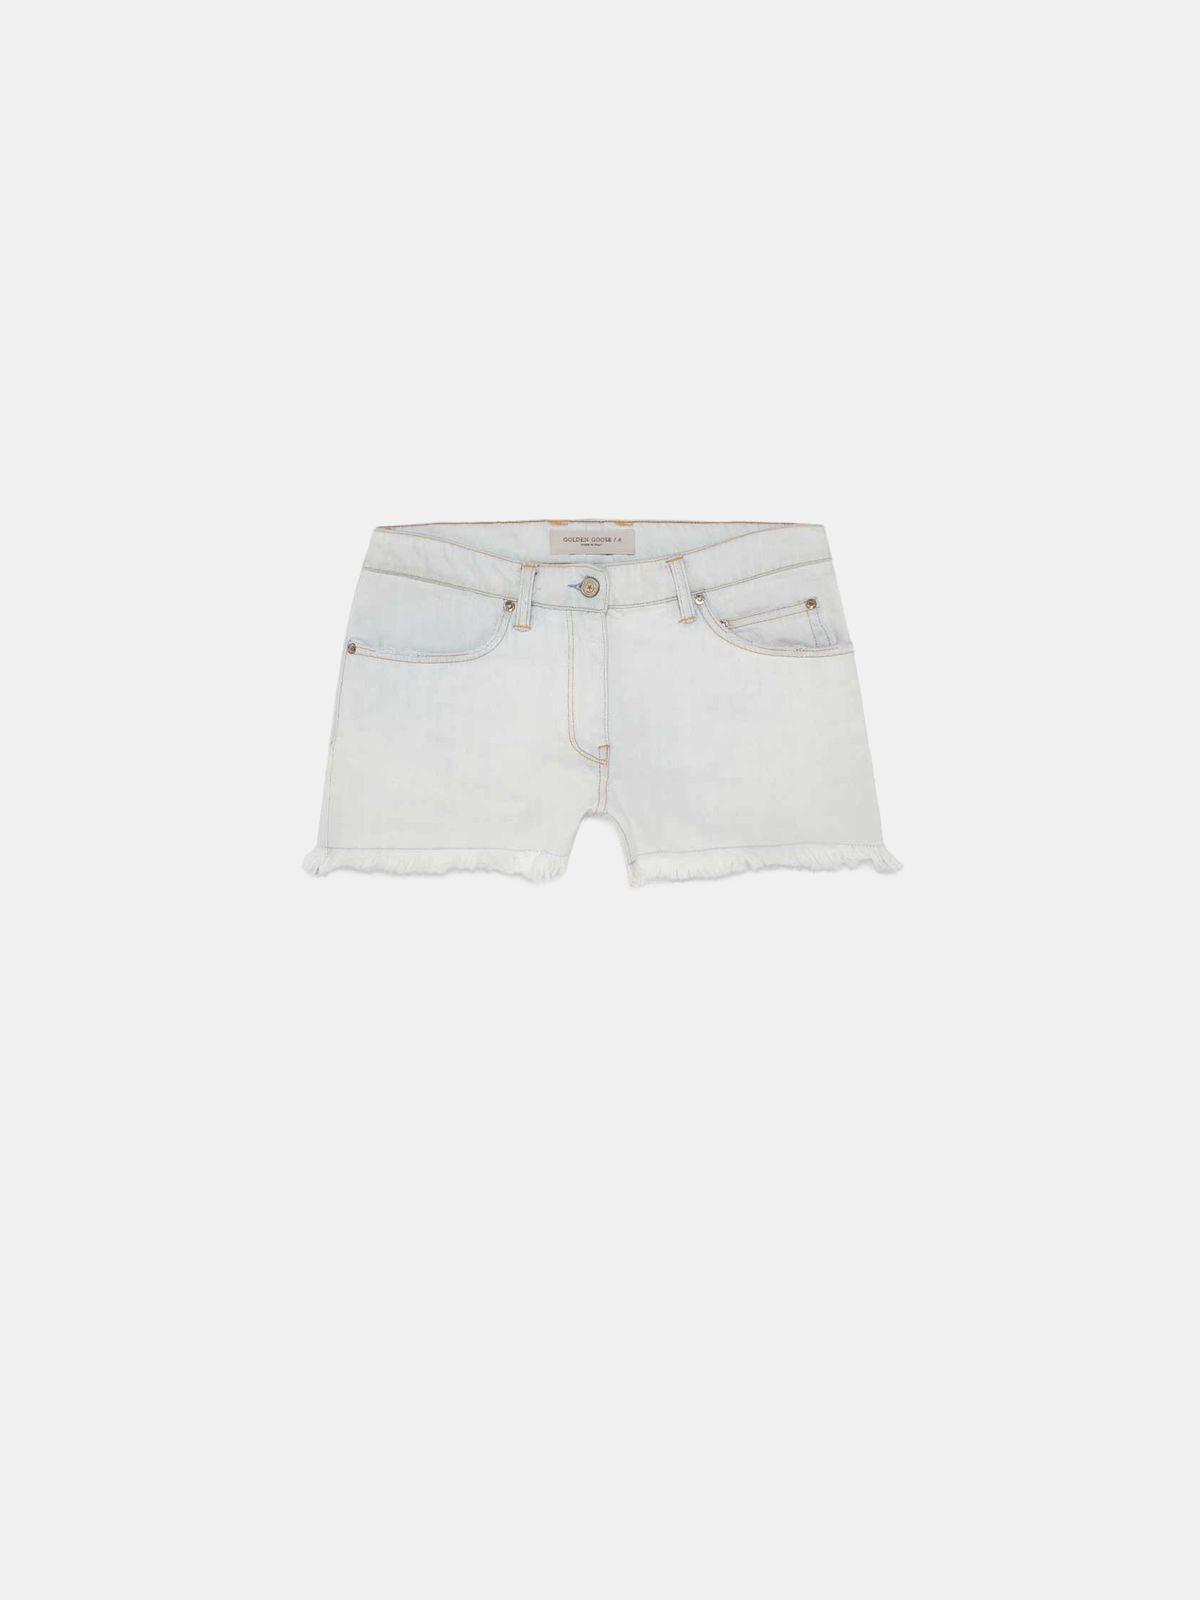 Golden Goose - Zoey shorts in lightened denim with fringed hem in